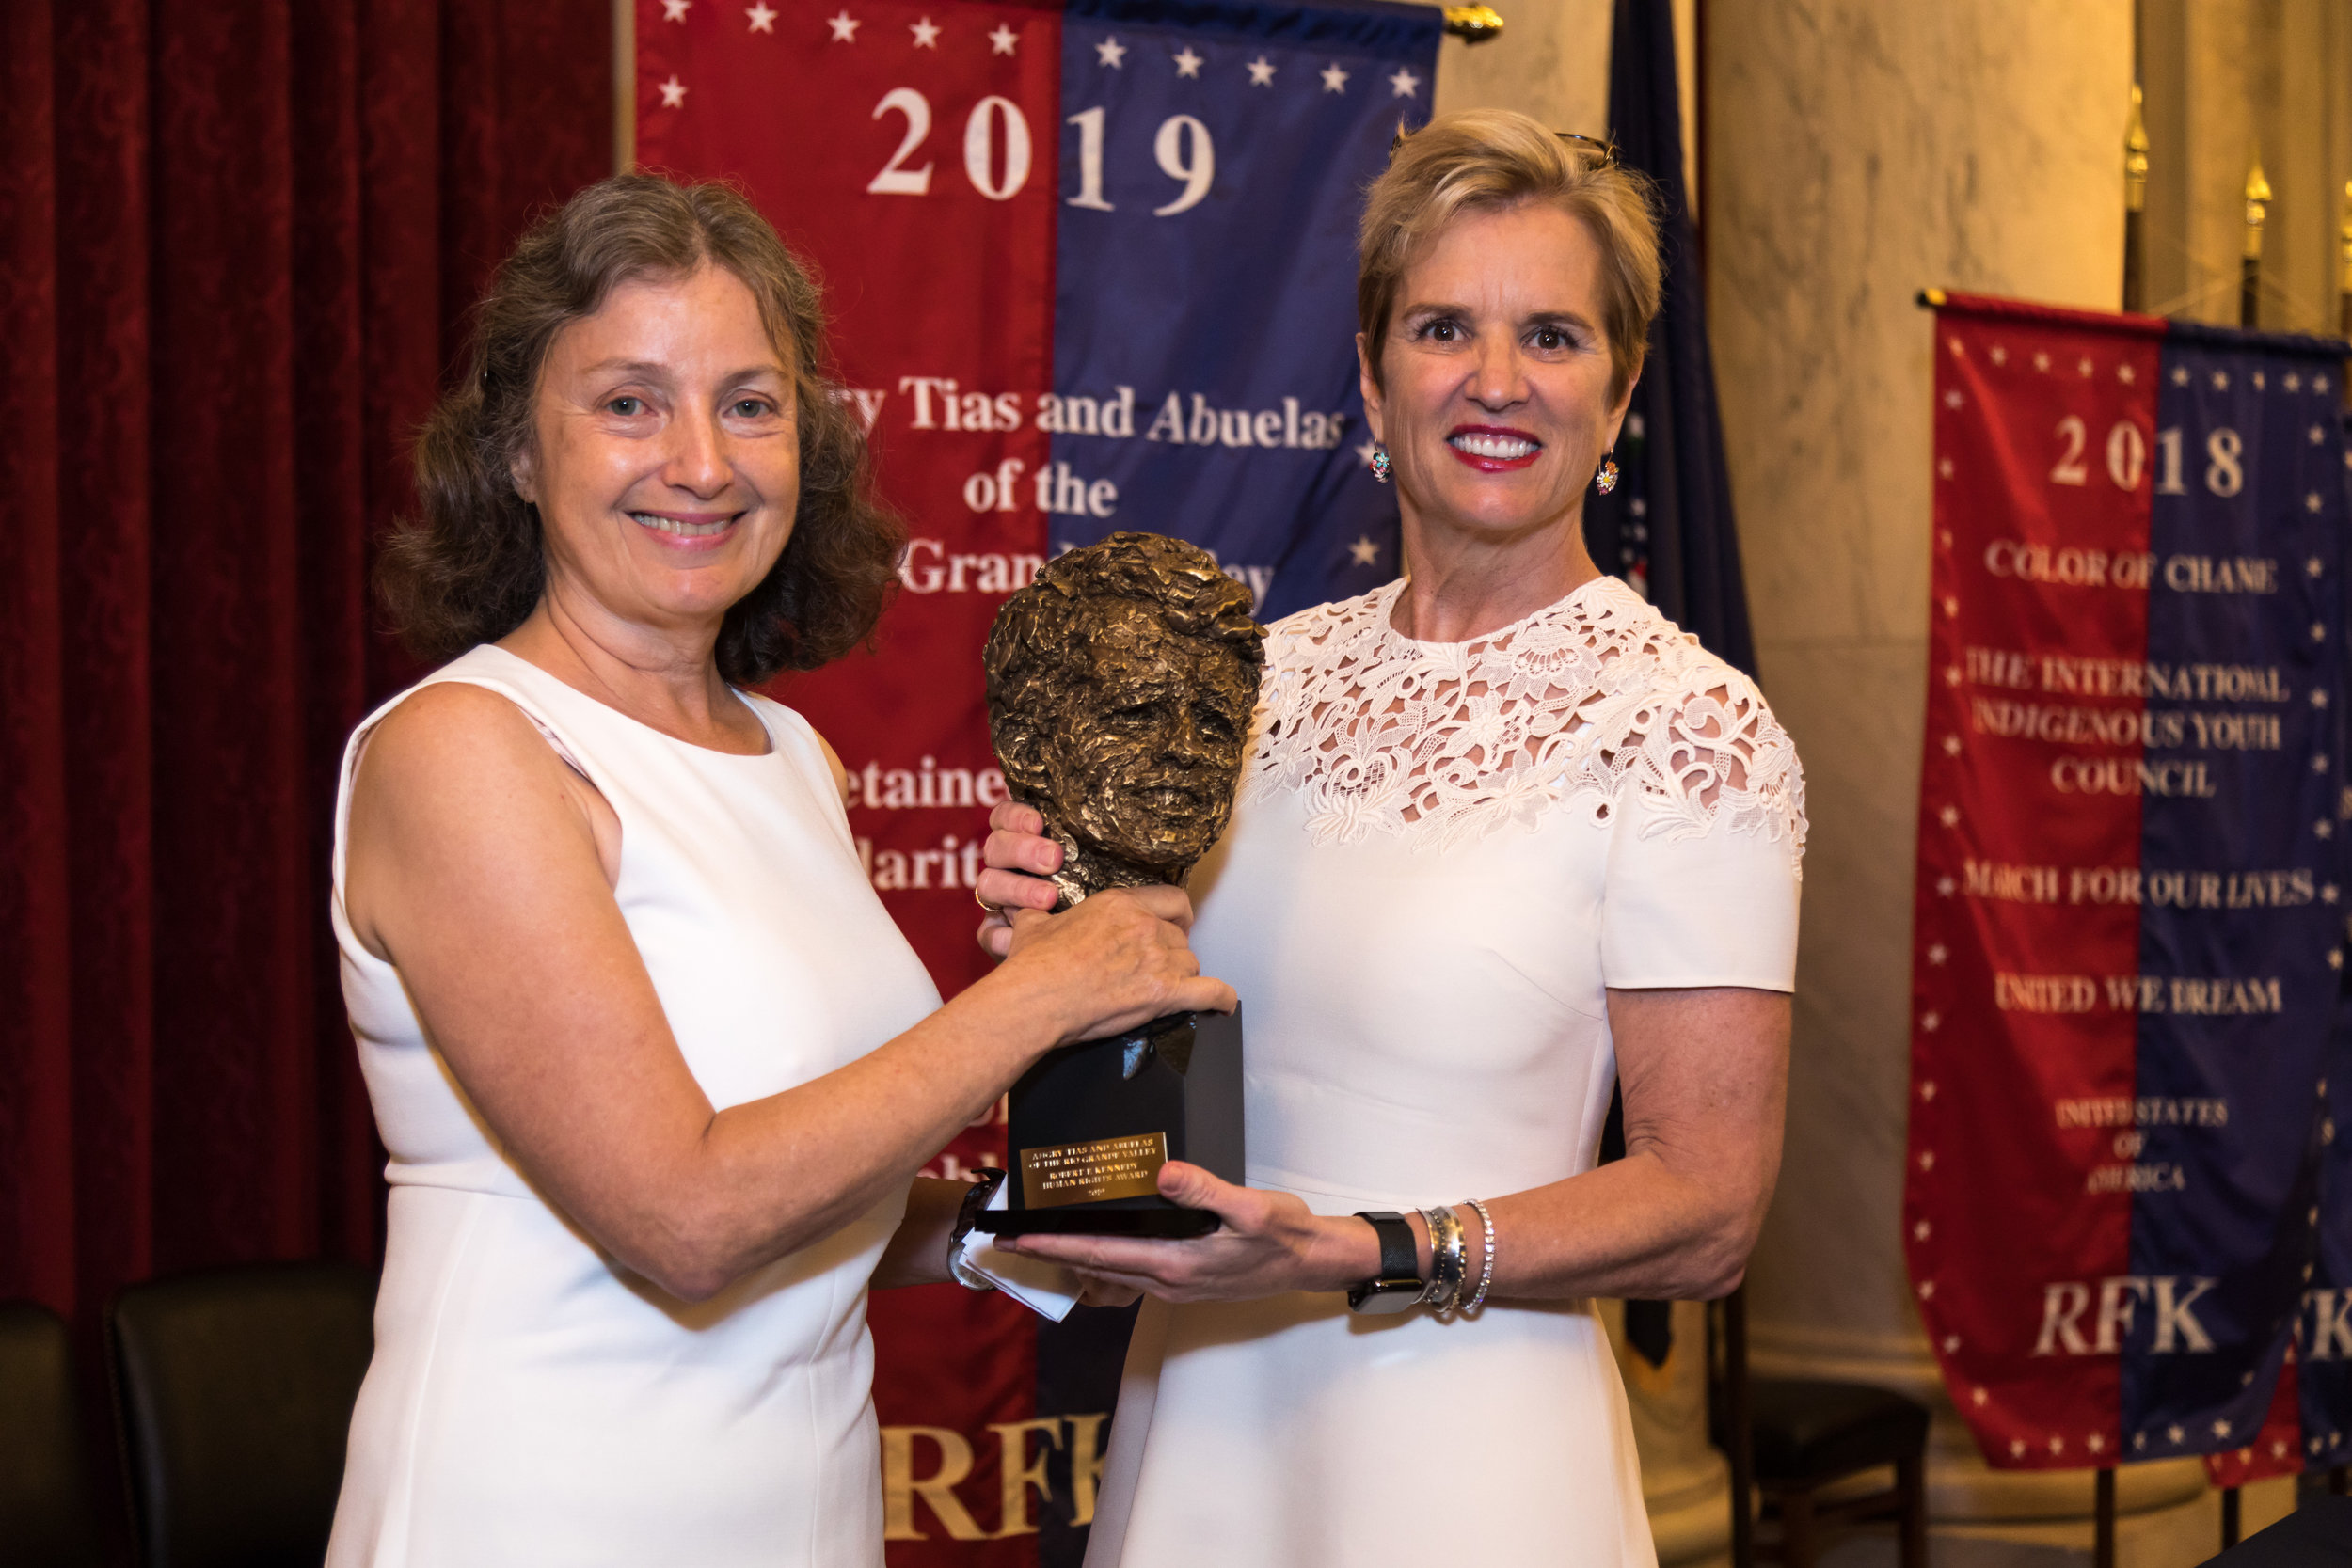 RFK - 2019 - Human Rights Awards-16.jpg